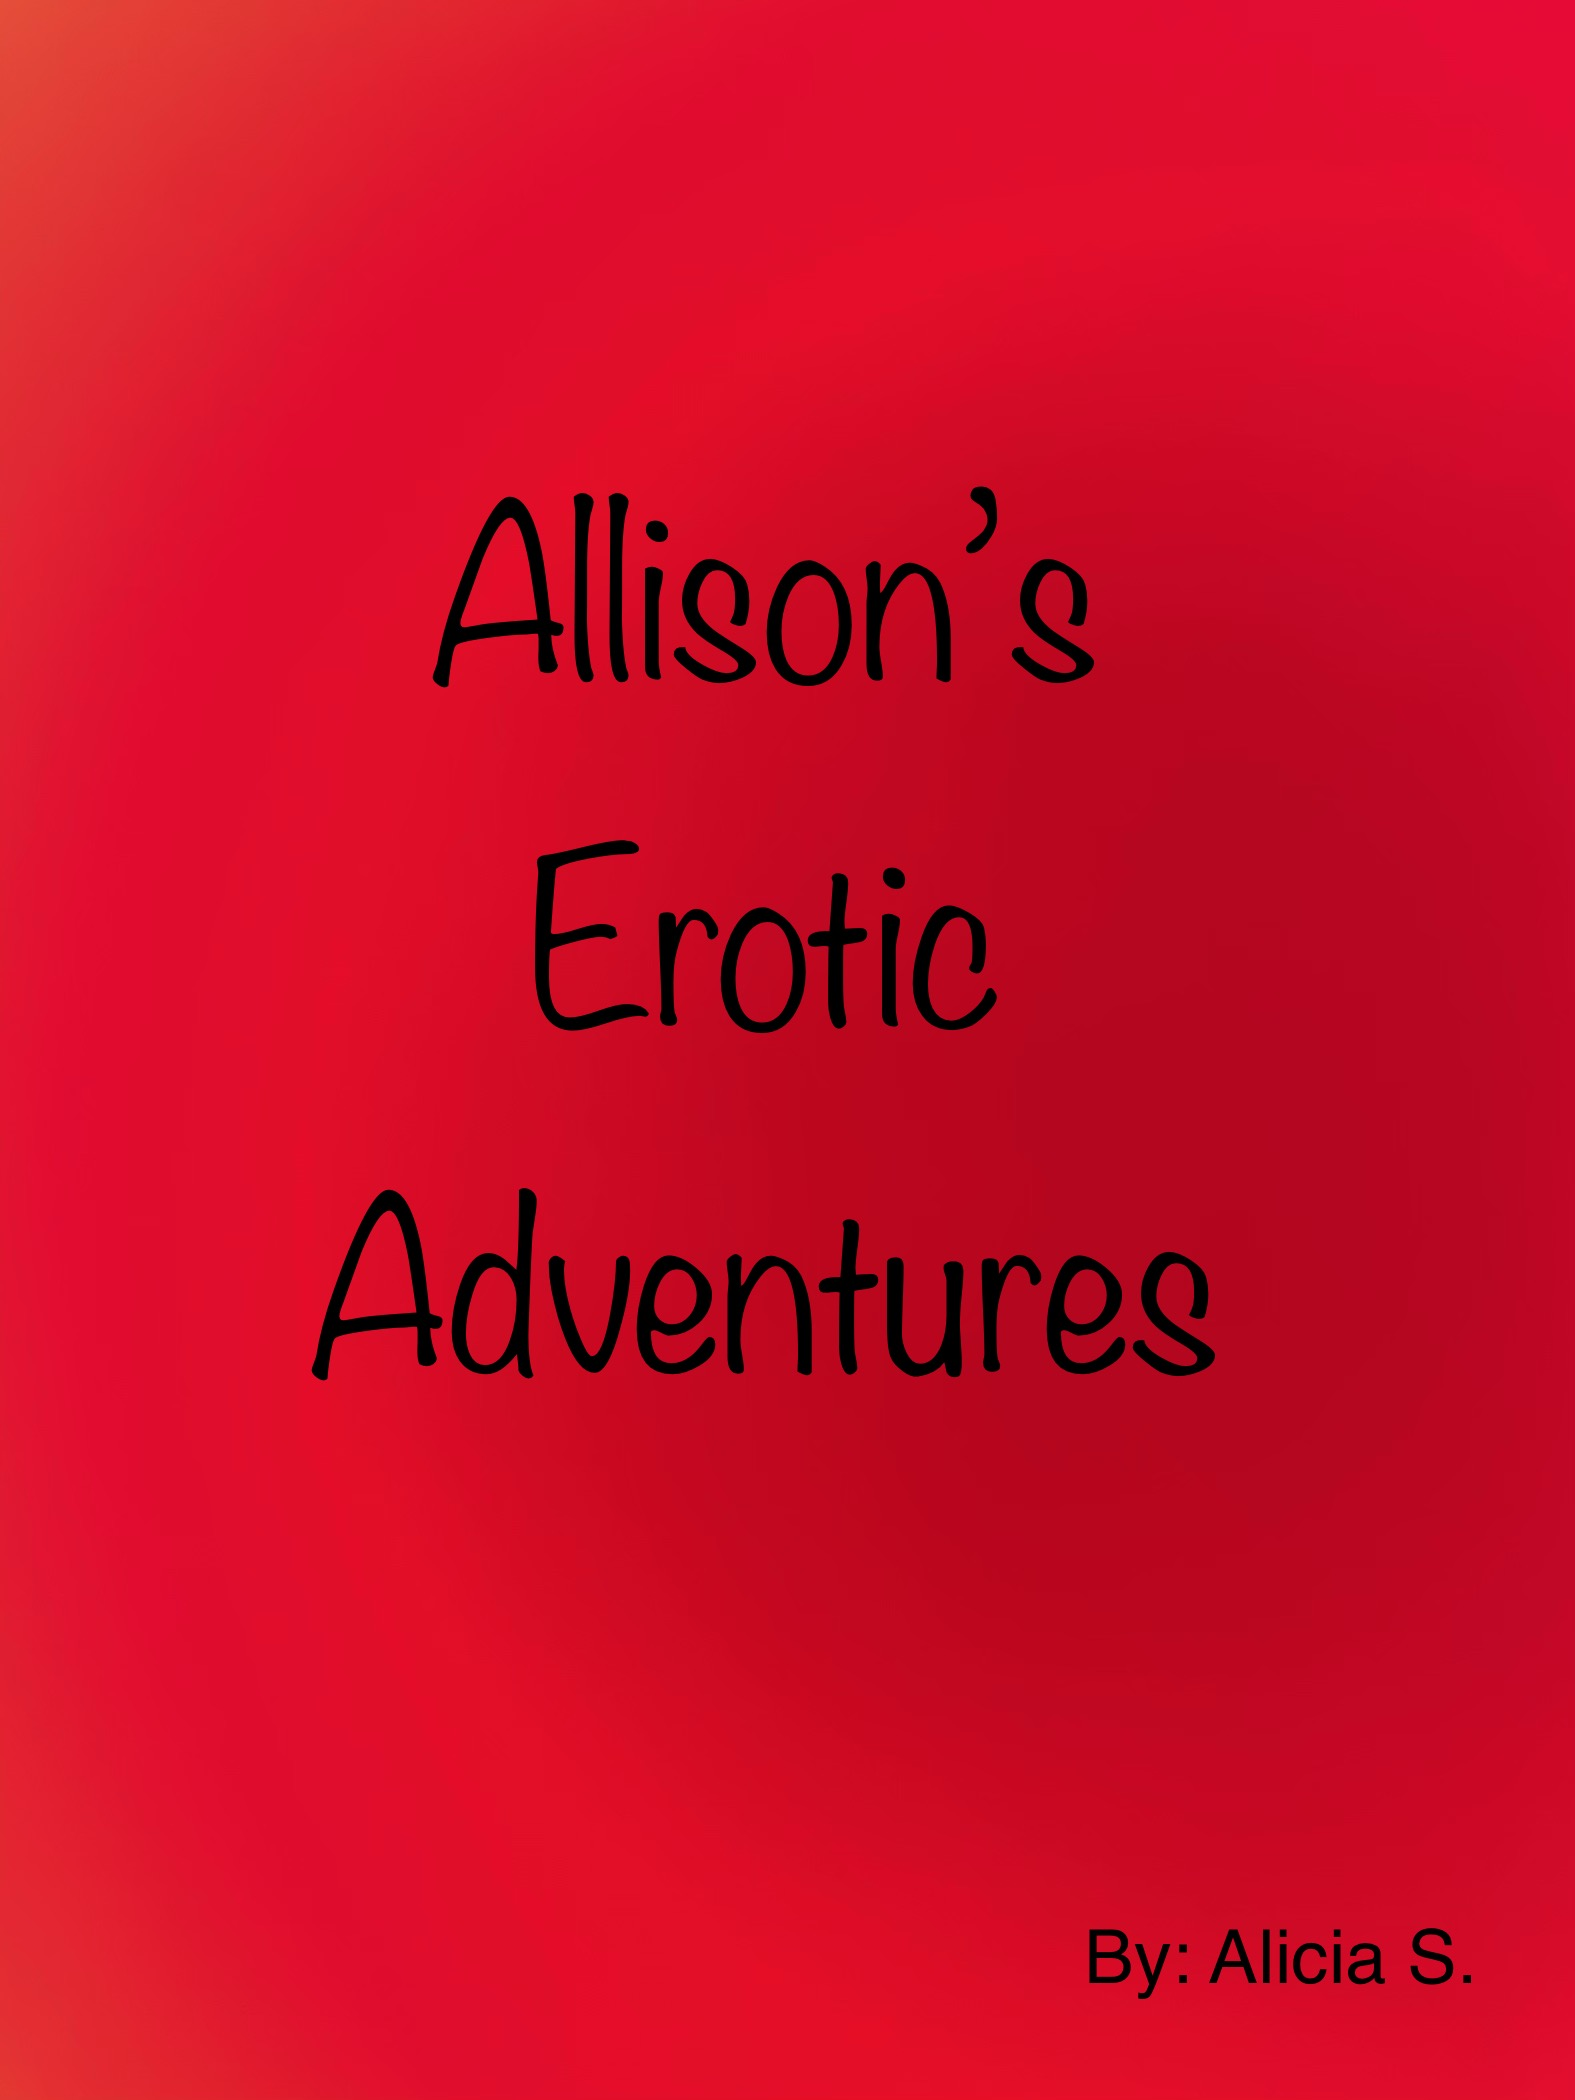 Allison's Erotic Adventures